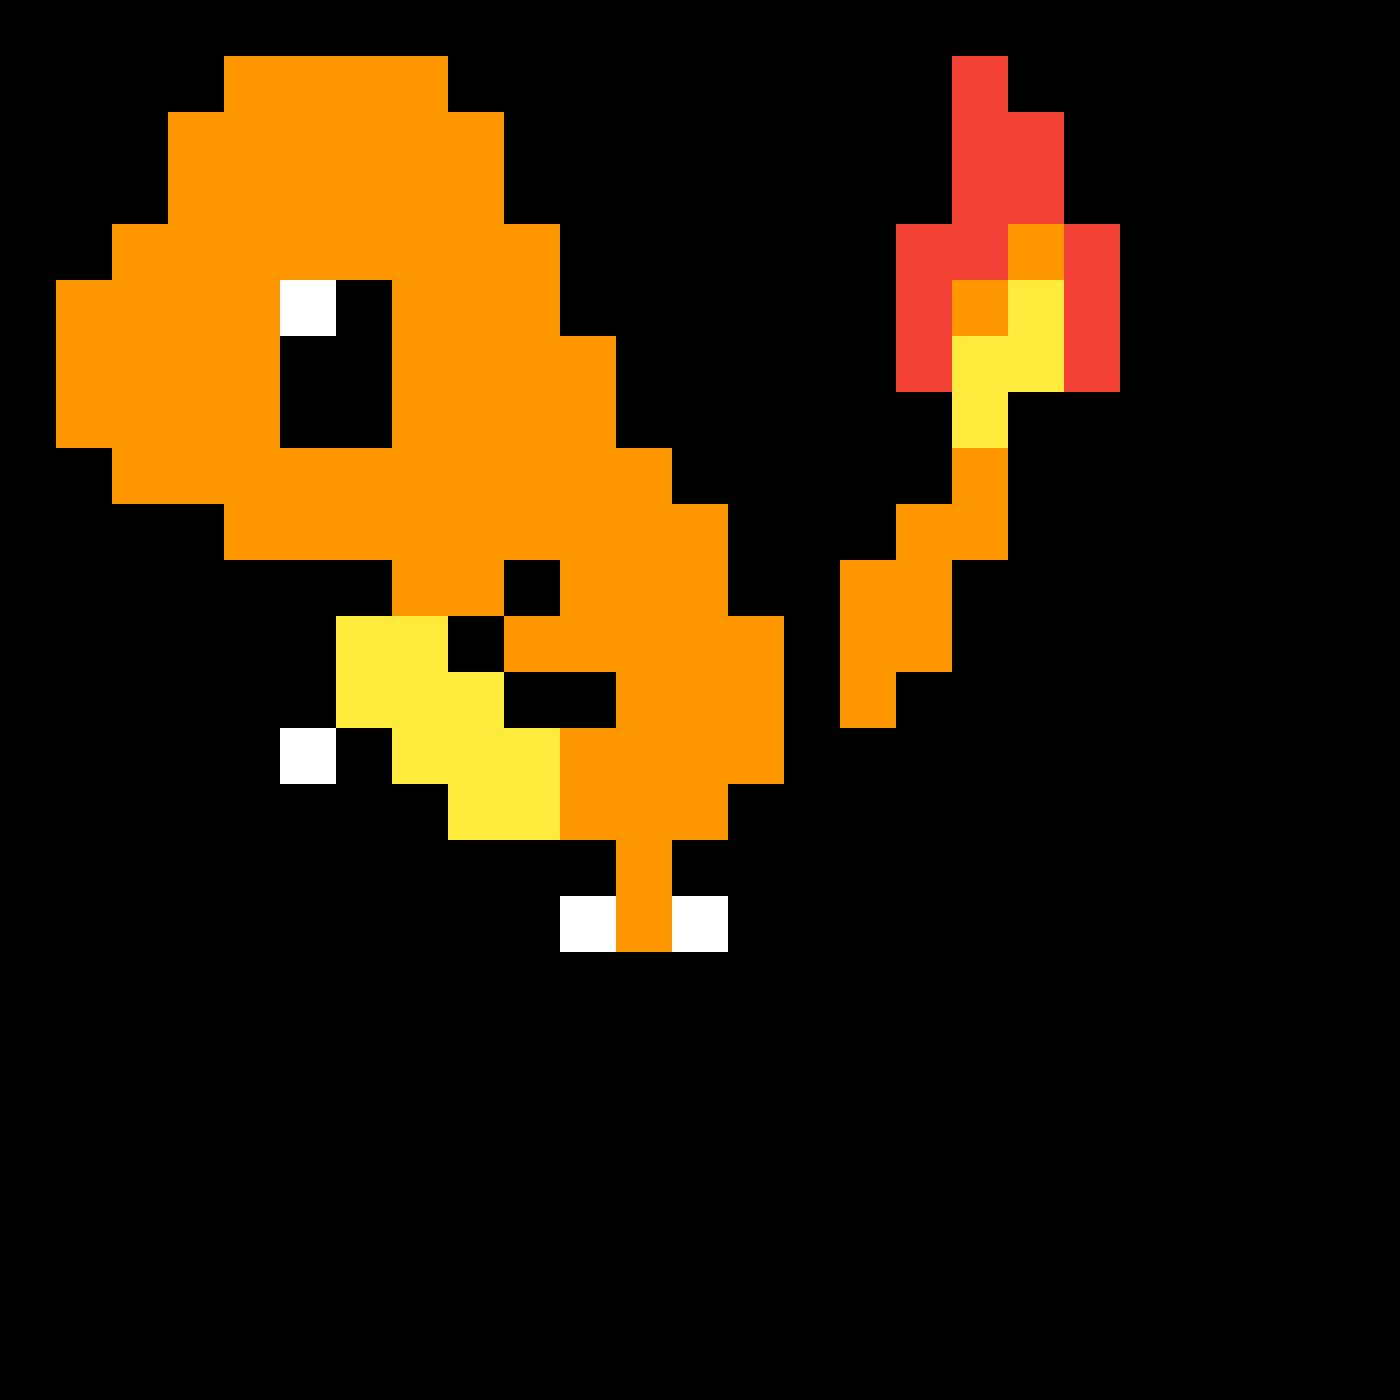 Pixel art gif clipart clipart black and white stock Pikachu Charmander Pixel art GIF - pikachu png download ... clipart black and white stock